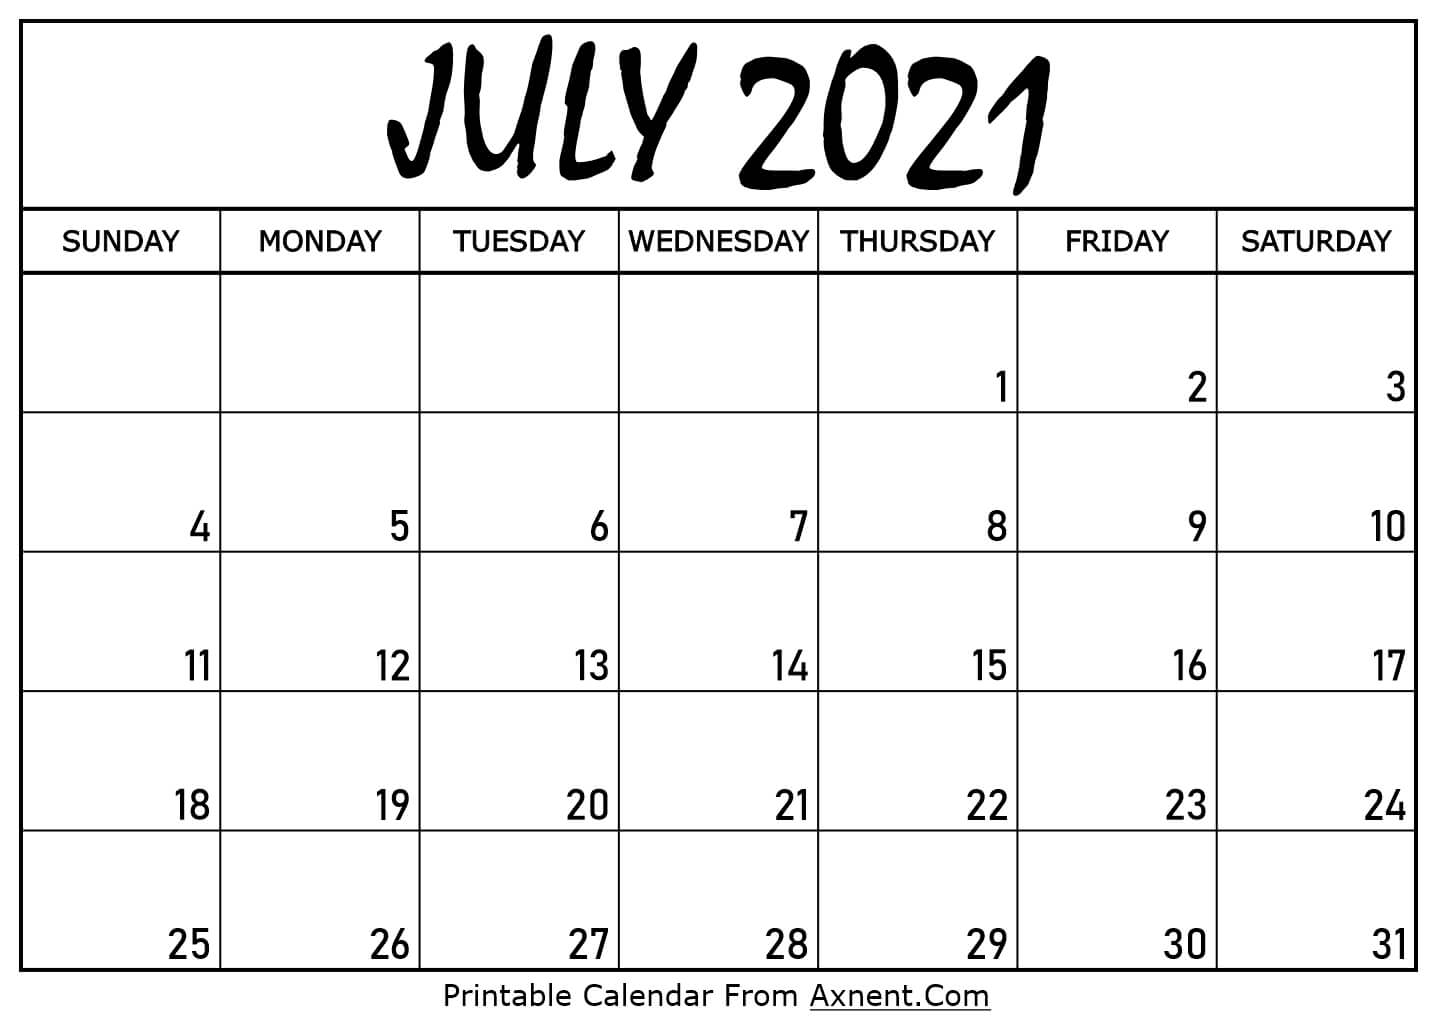 Printable July 2021 Calendar Template Time Management